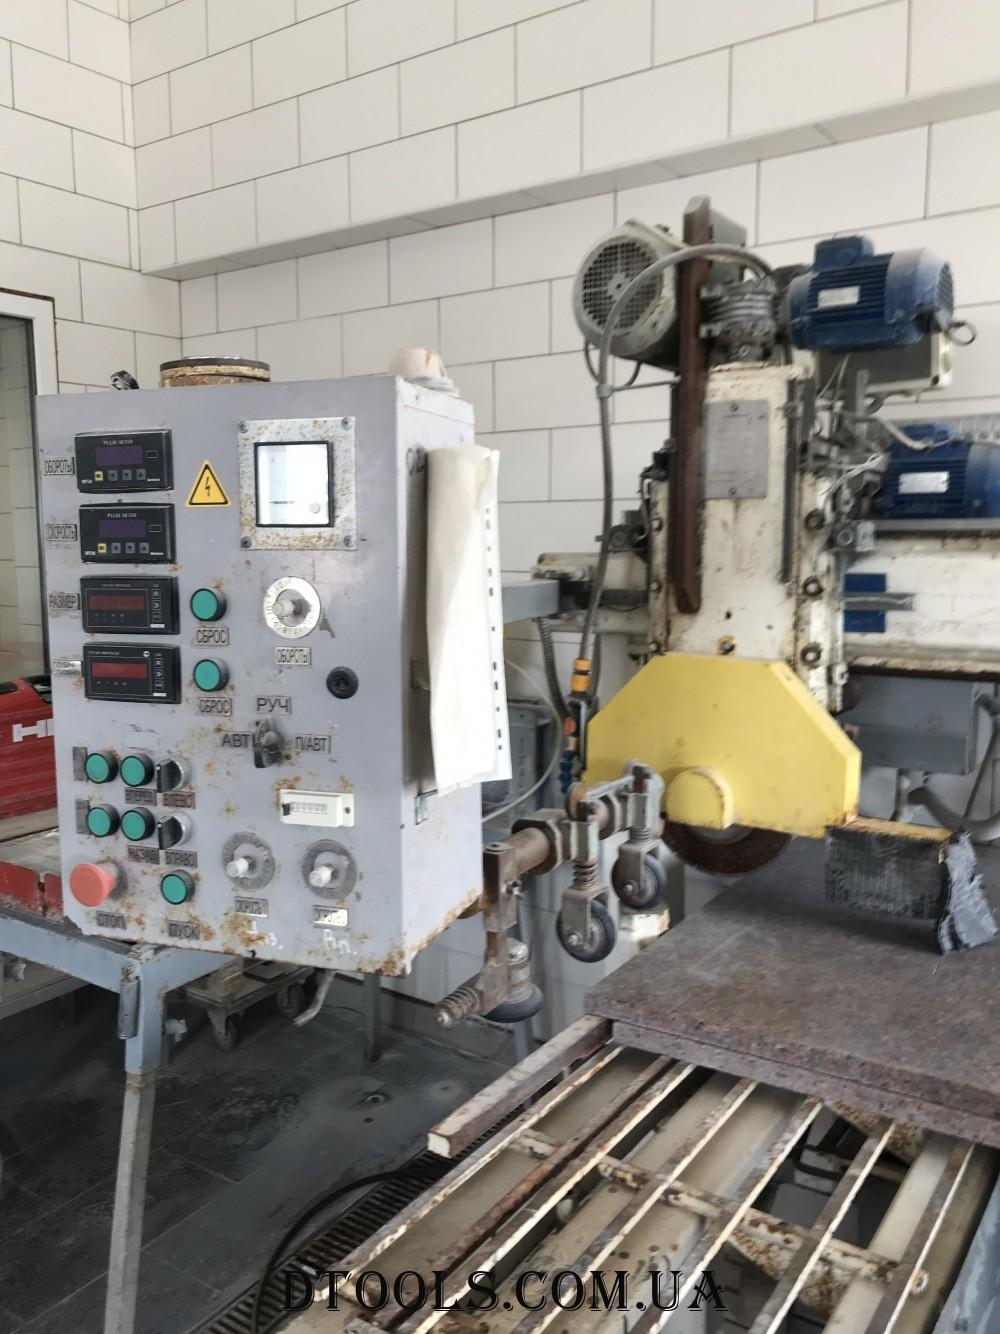 Плиткорез TS-500 Etalon широкоформатный станок - 1